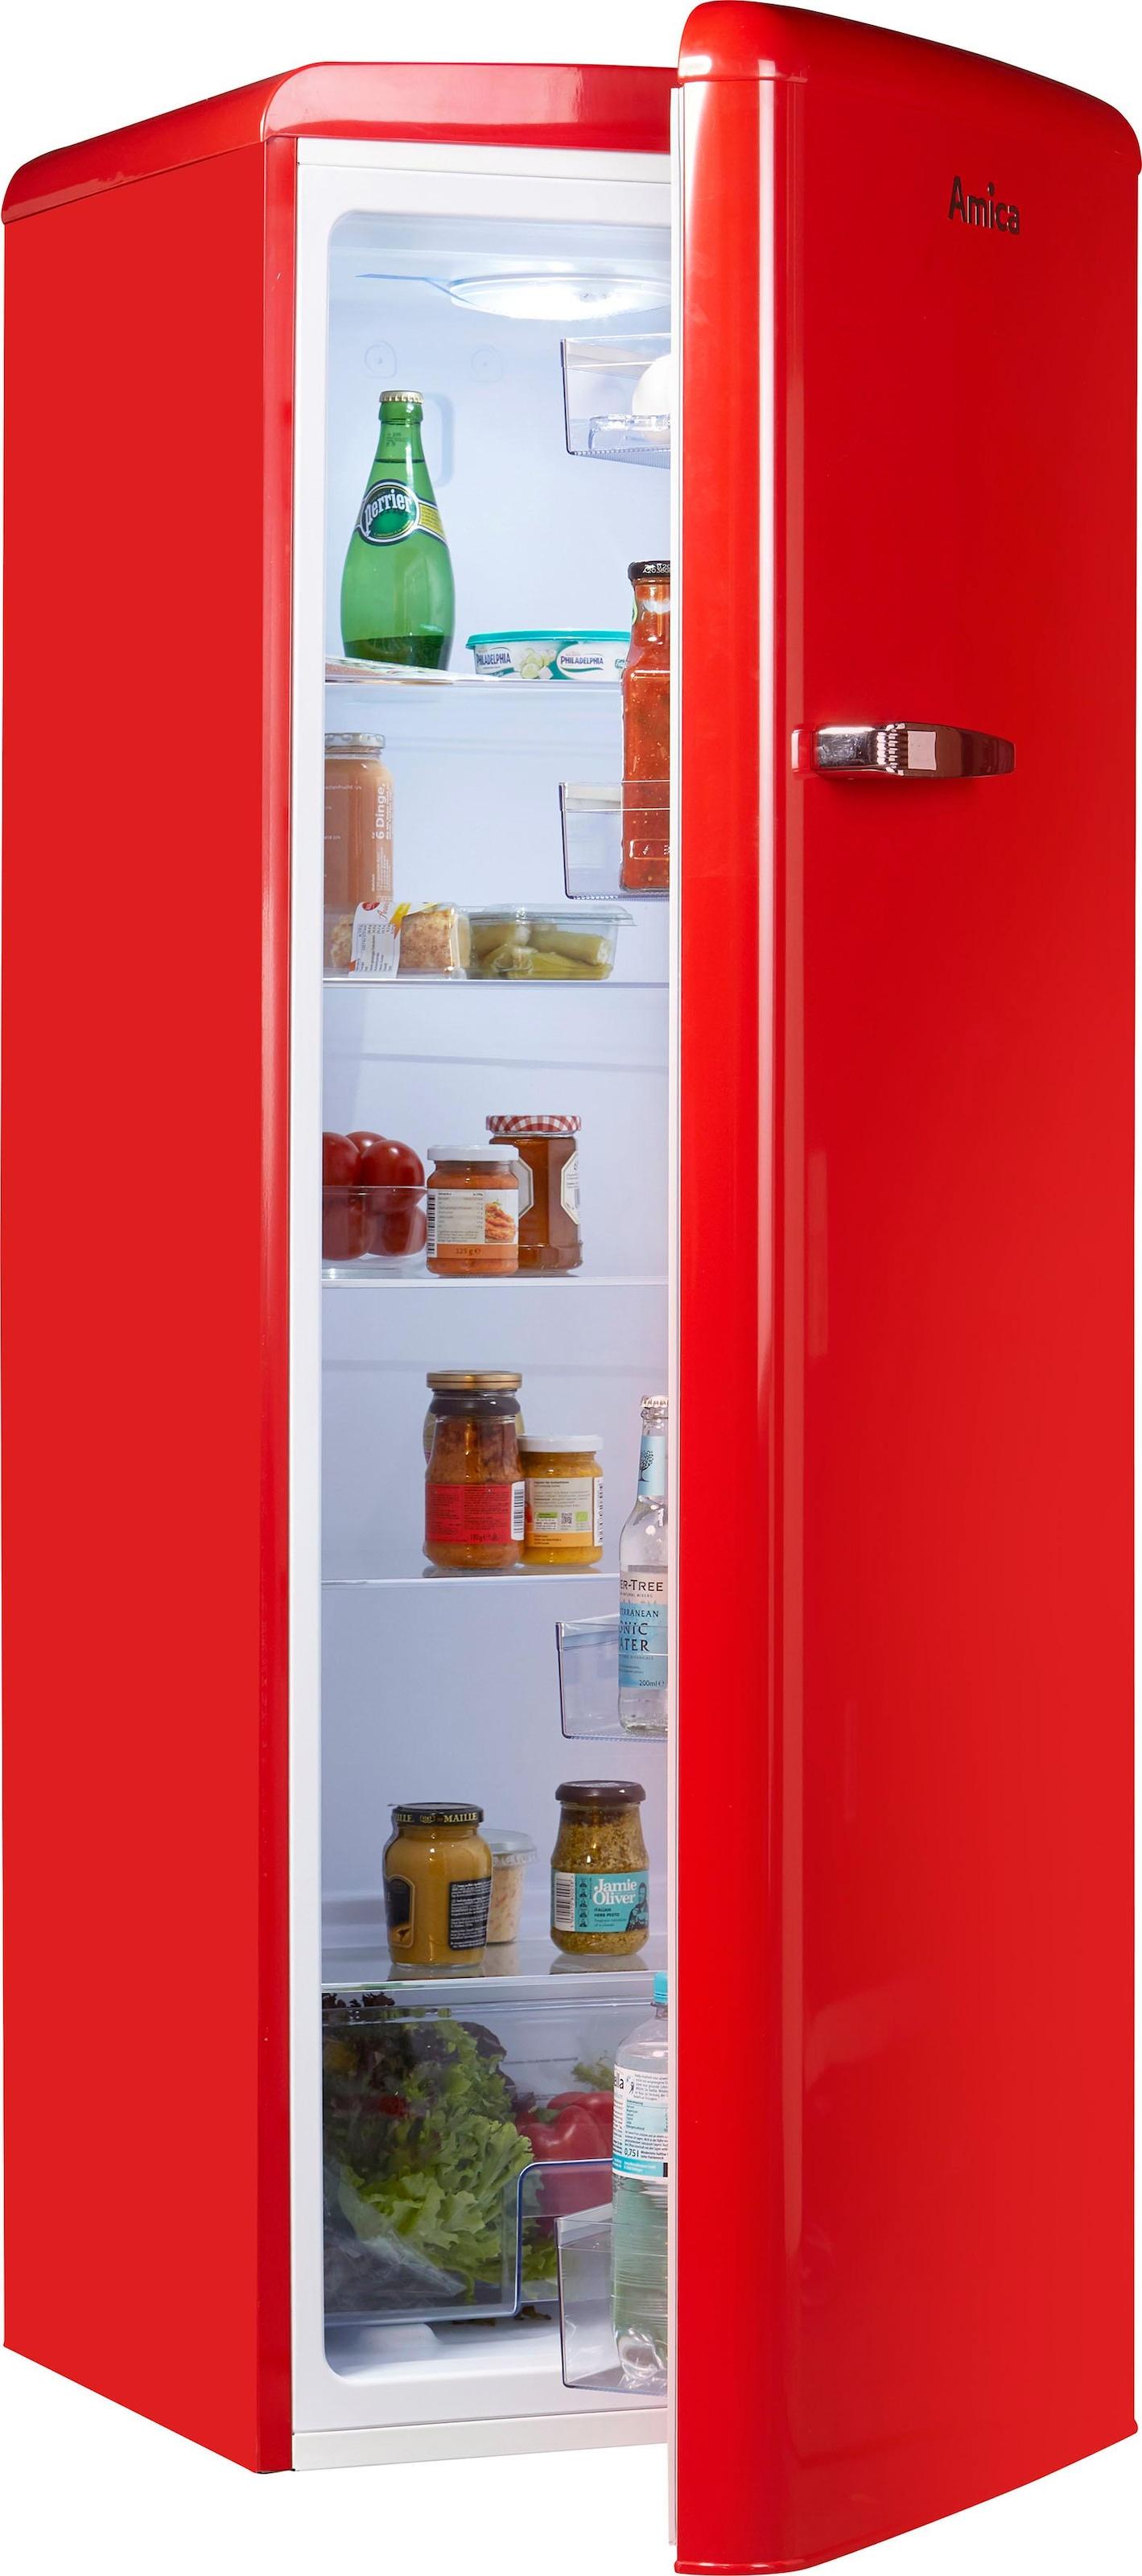 Amica Kühlschrank Firma : Amica kühlschrank cm hoch cm breit baur